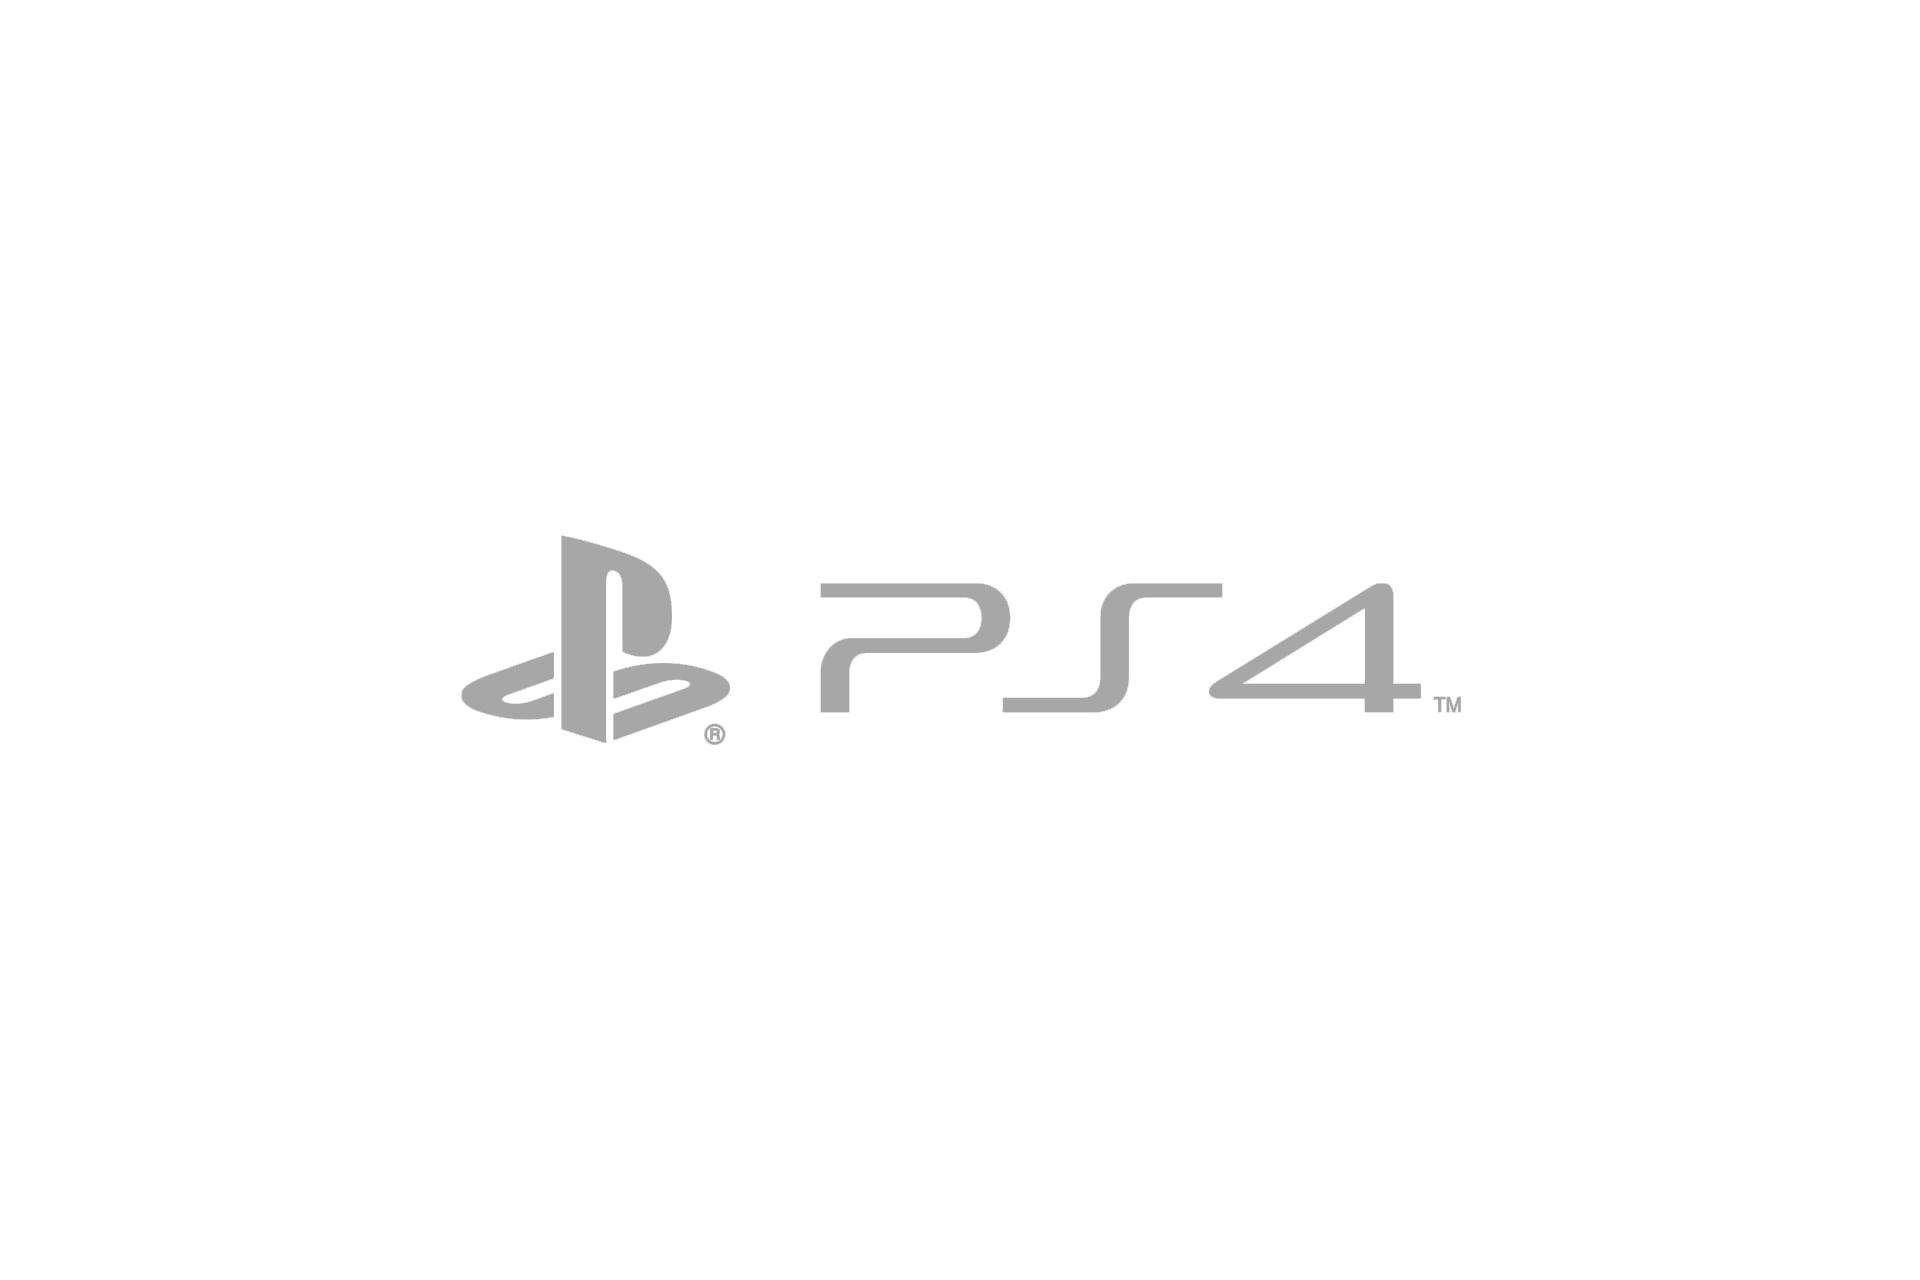 ps4 logo grey